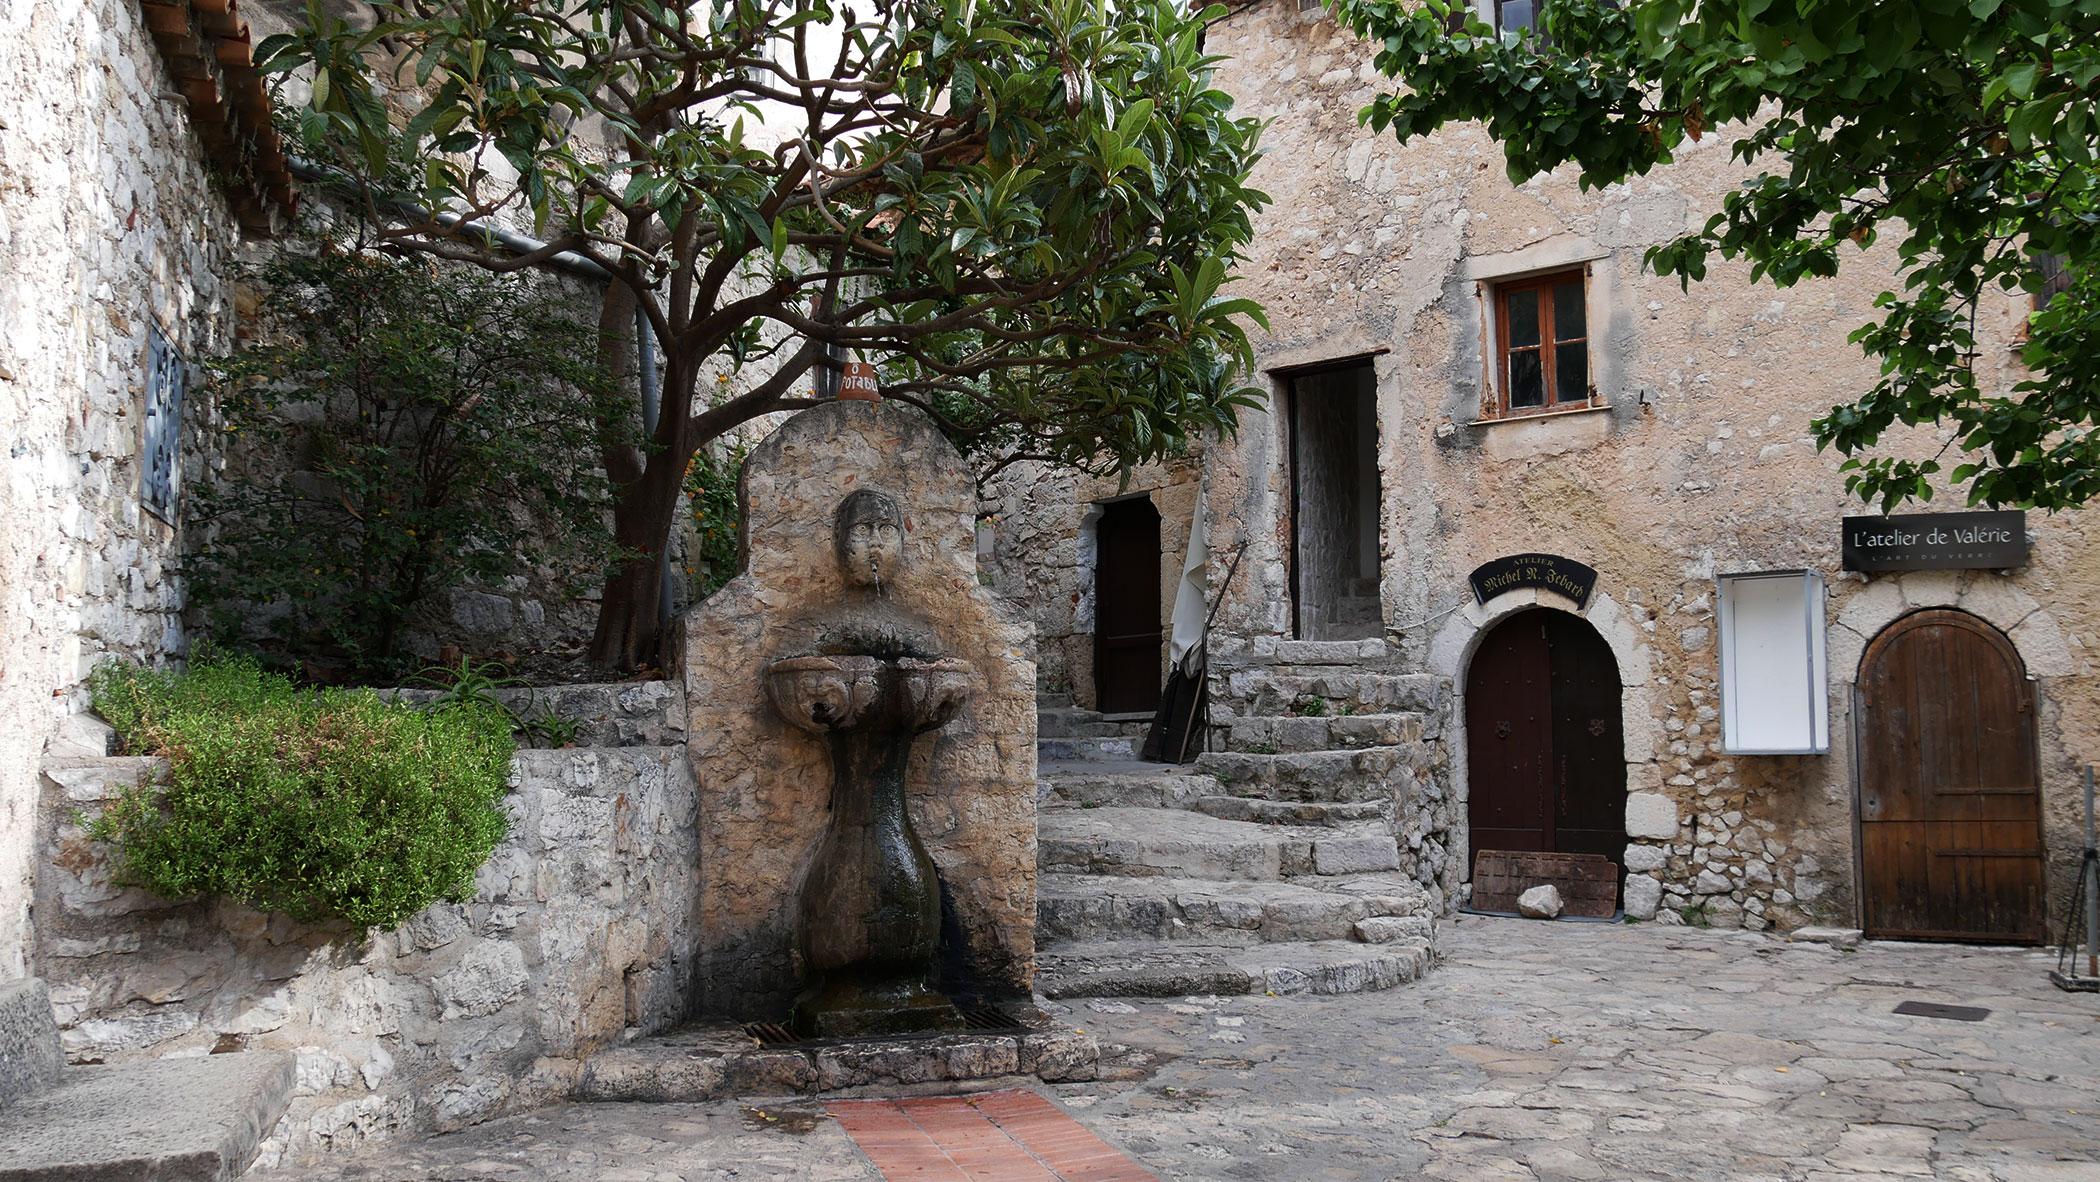 Brunnen in Èze